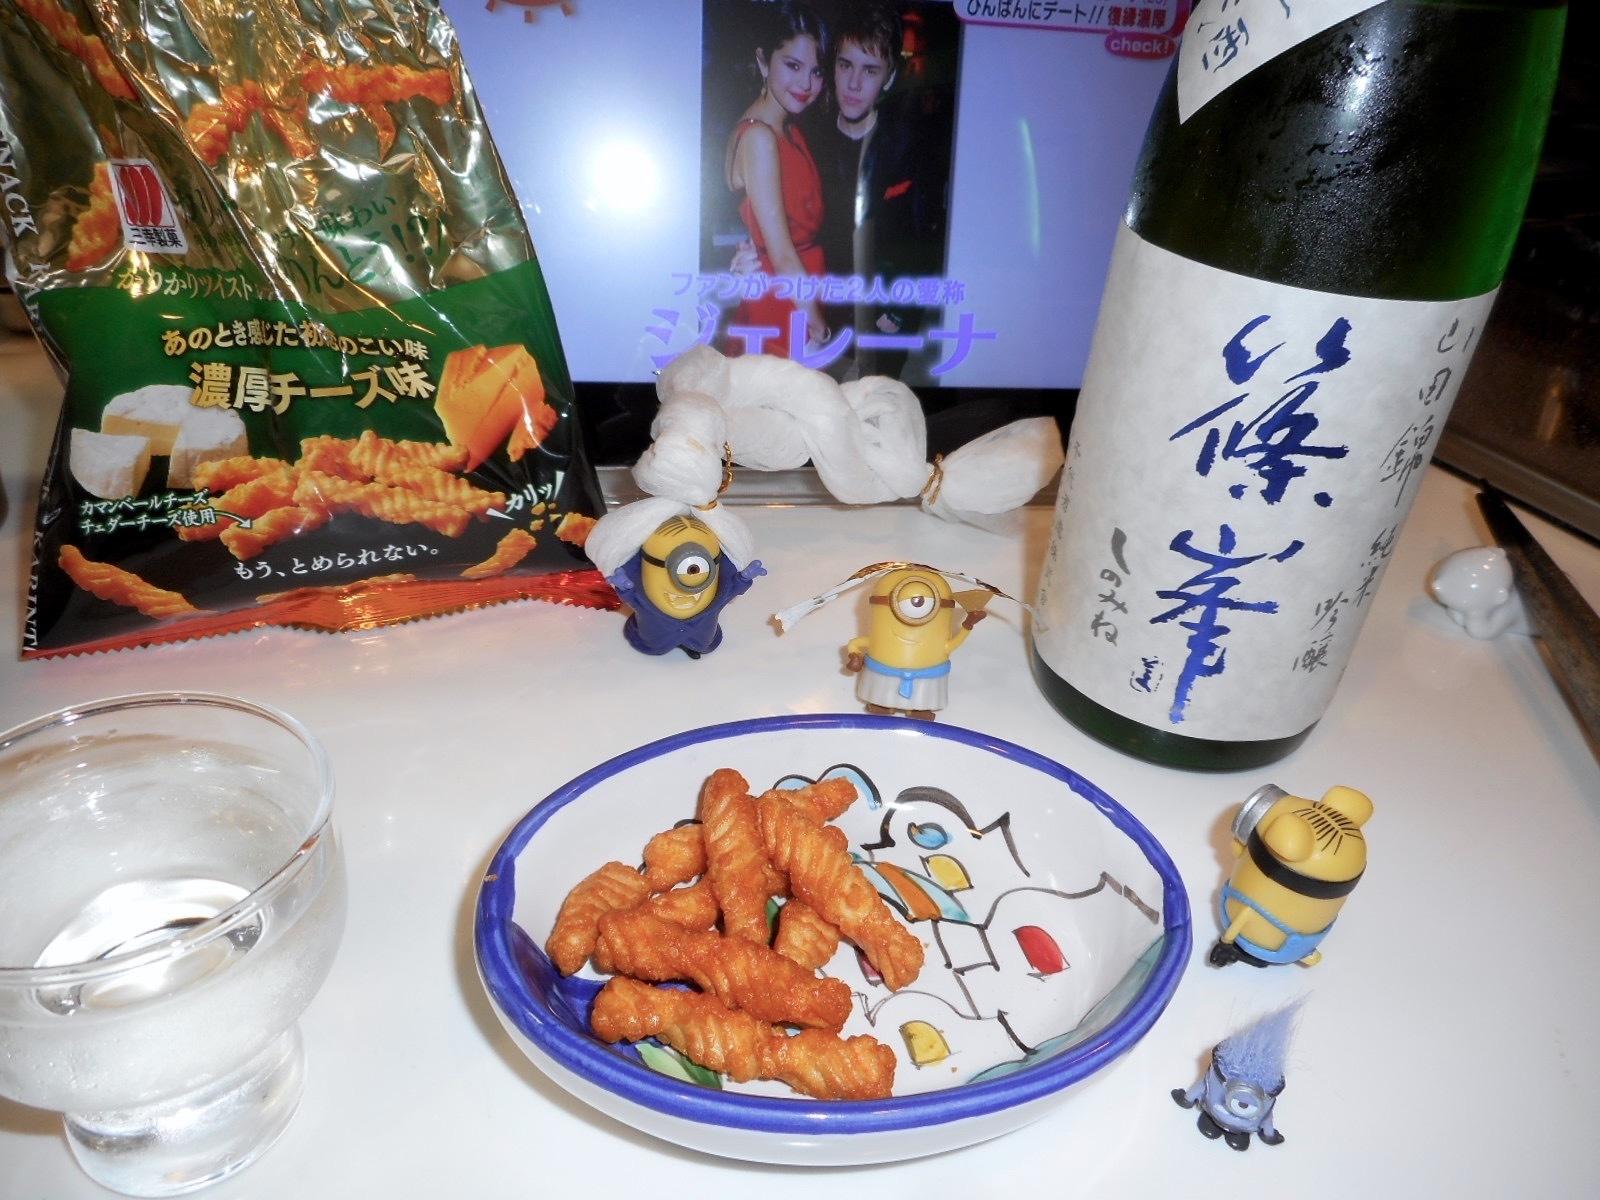 shinomine_sou_natsuiro28by6.jpg